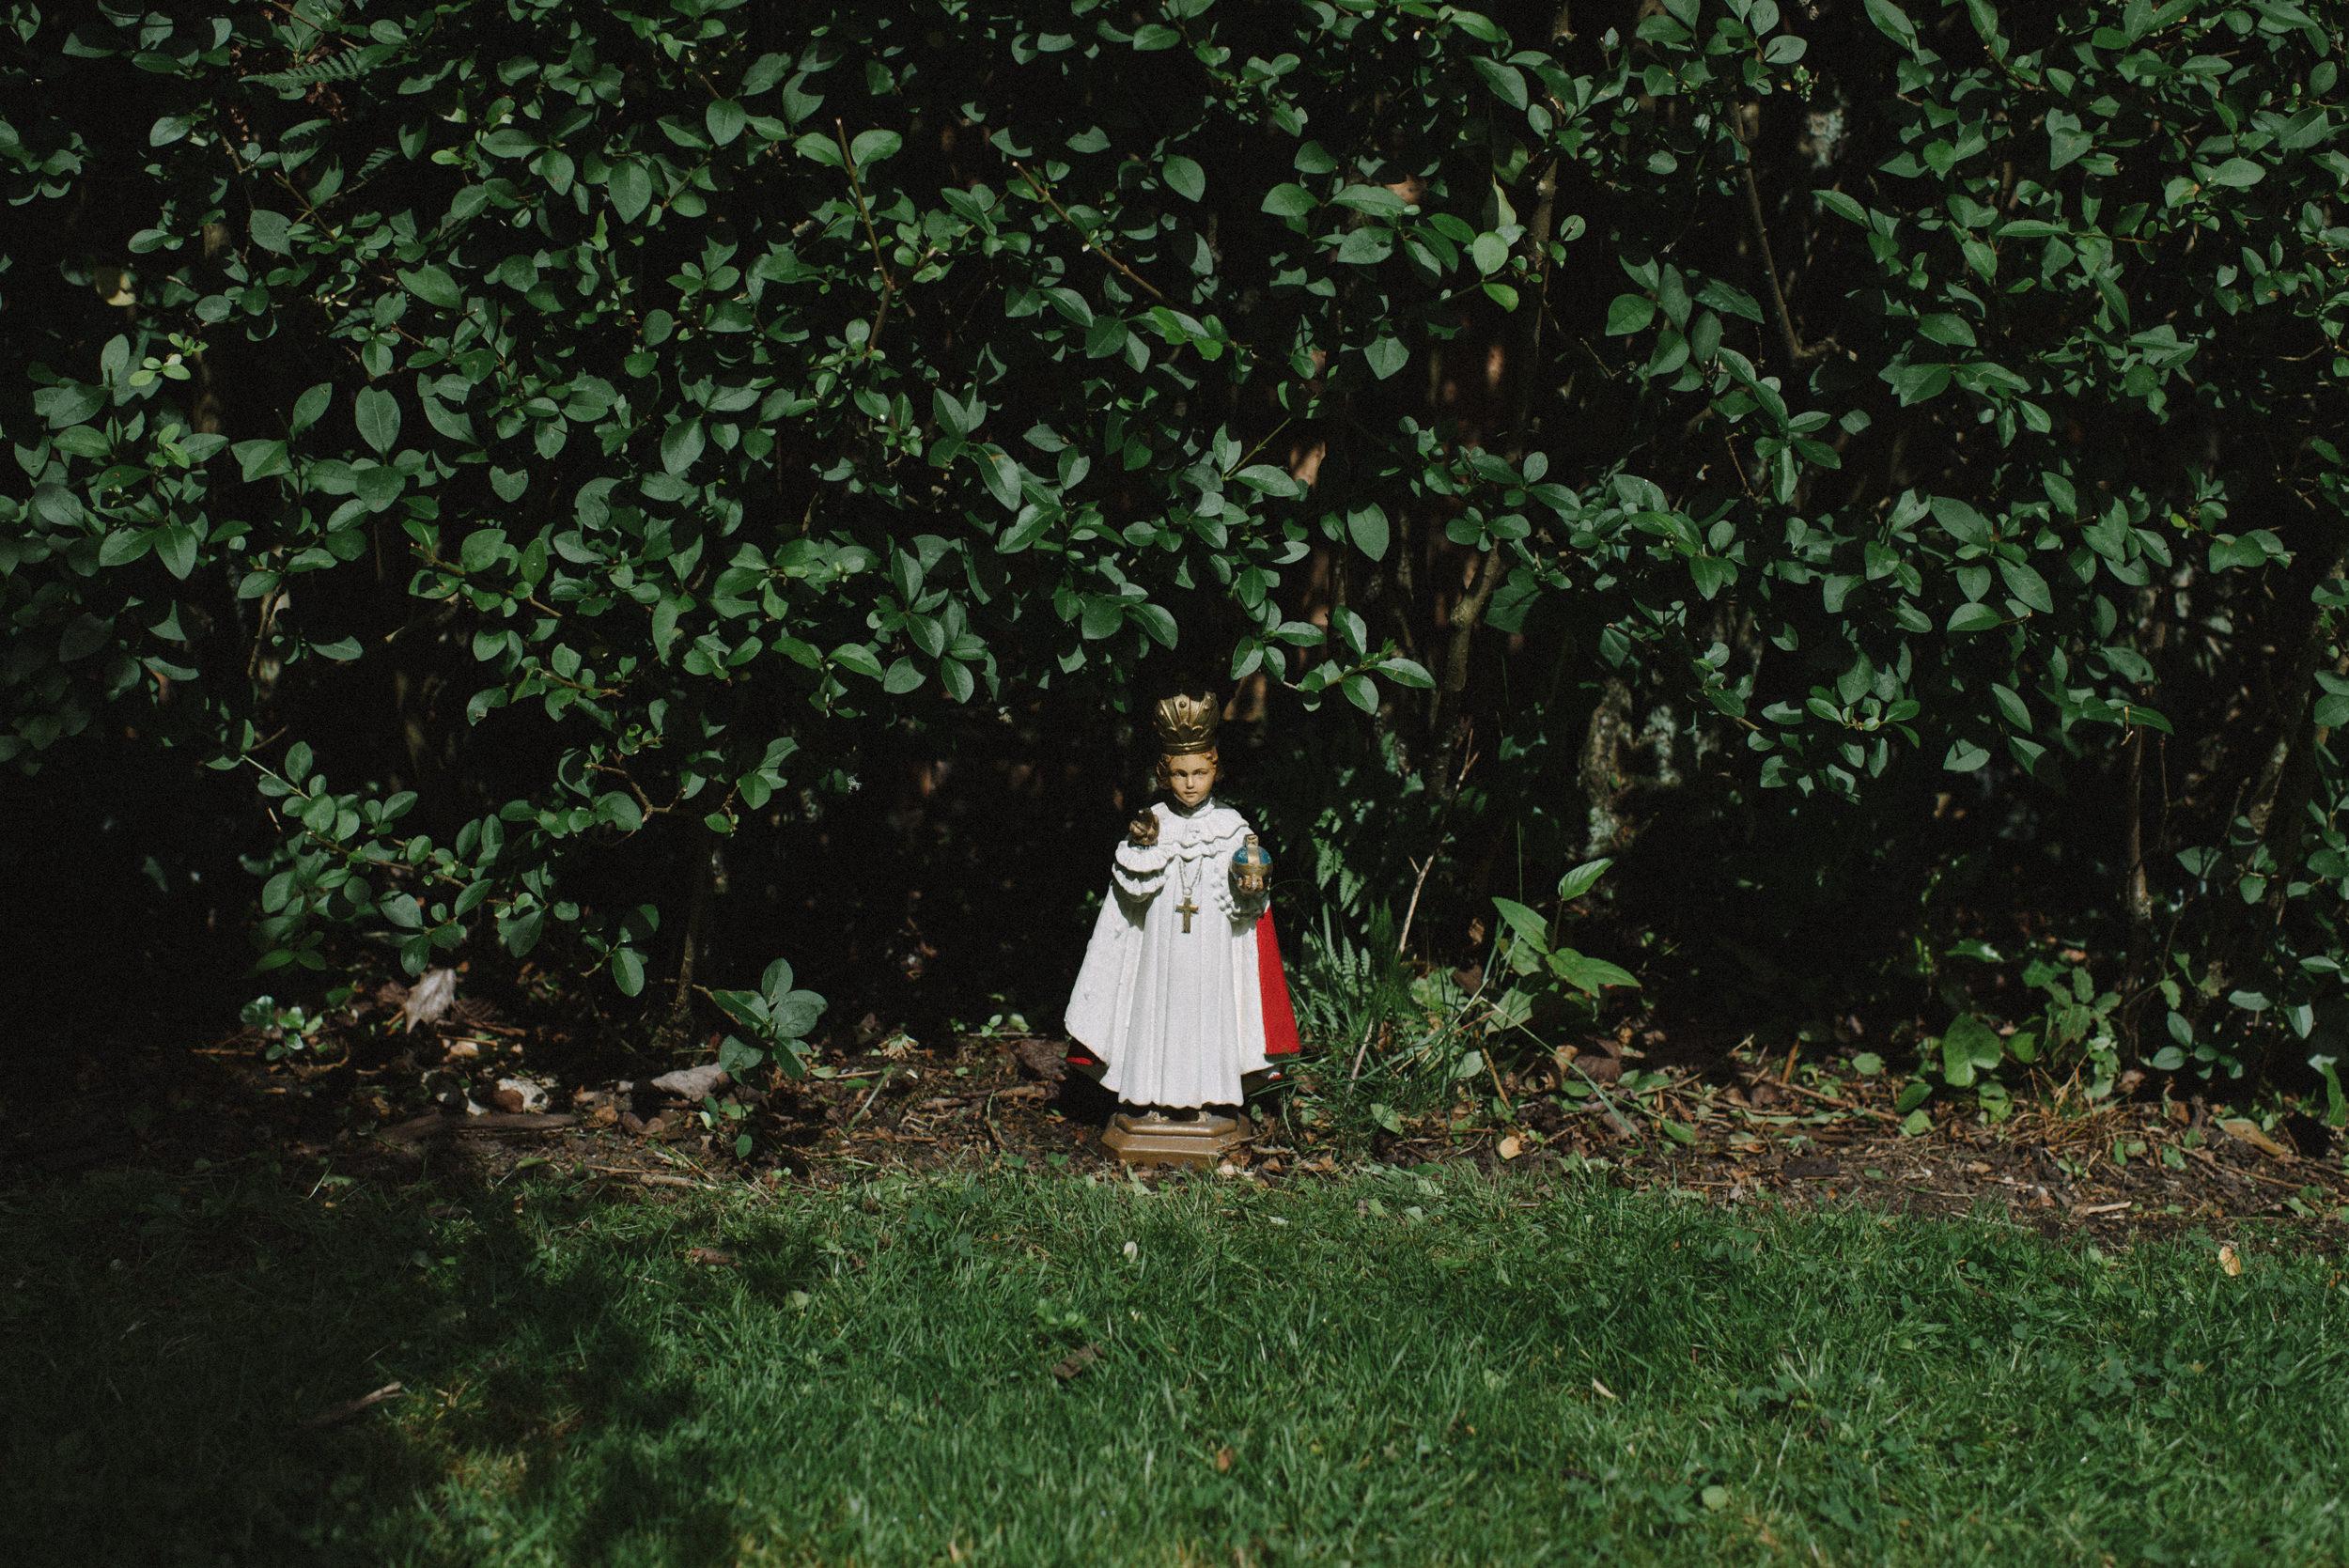 0095-alternative-wedding-portrait-family-kids-photographer-glasgow-scotland.JPG